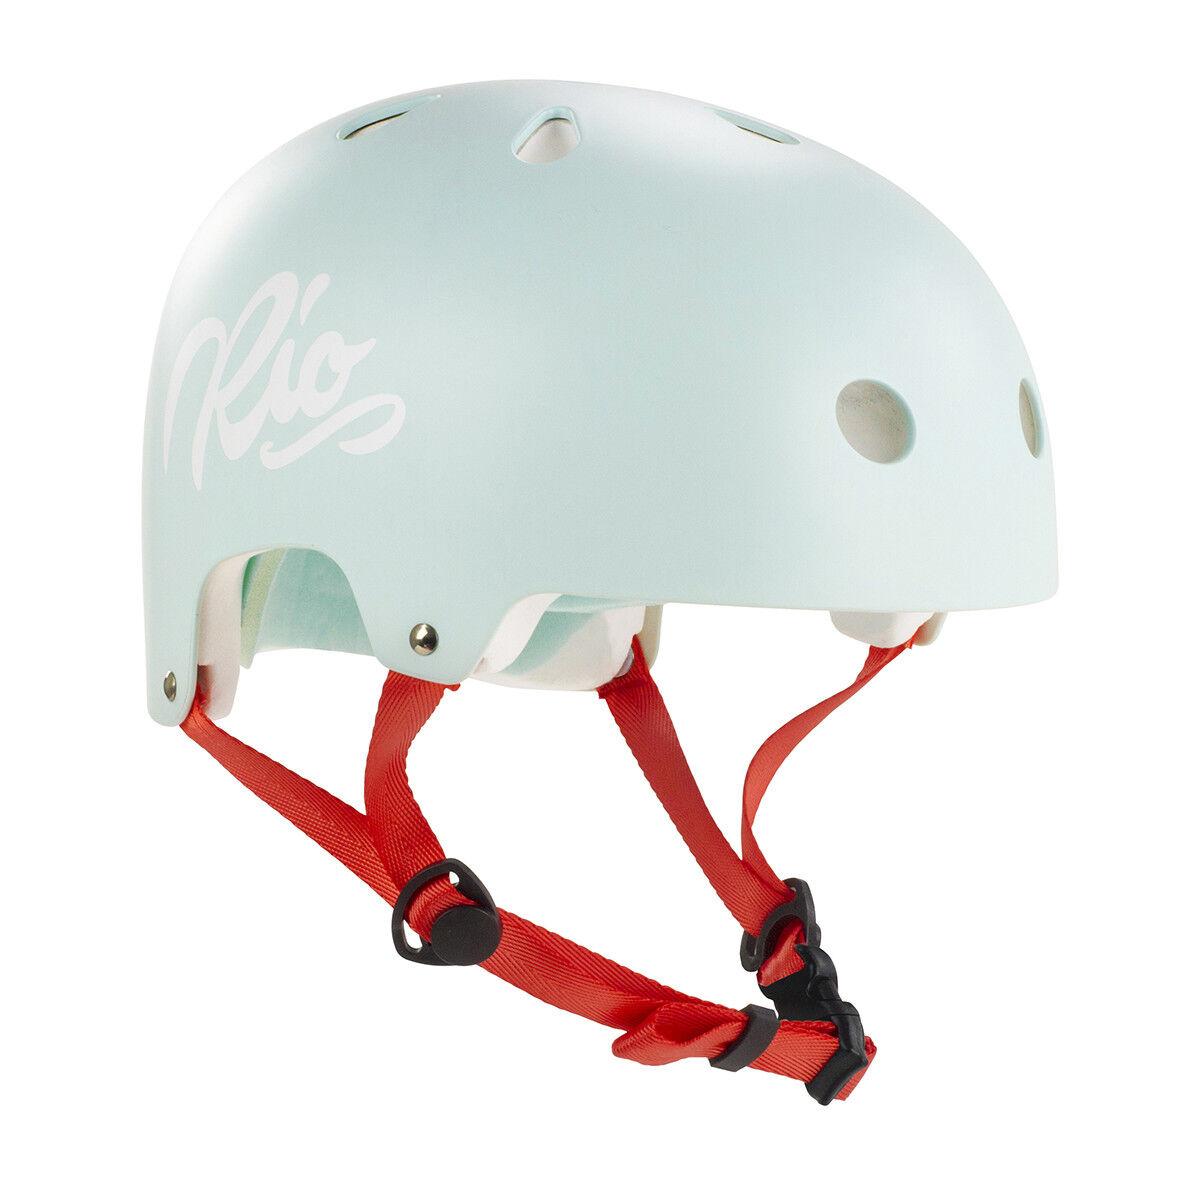 Rio Rio Rio Roller Schrift Skating Helm 4f0d80